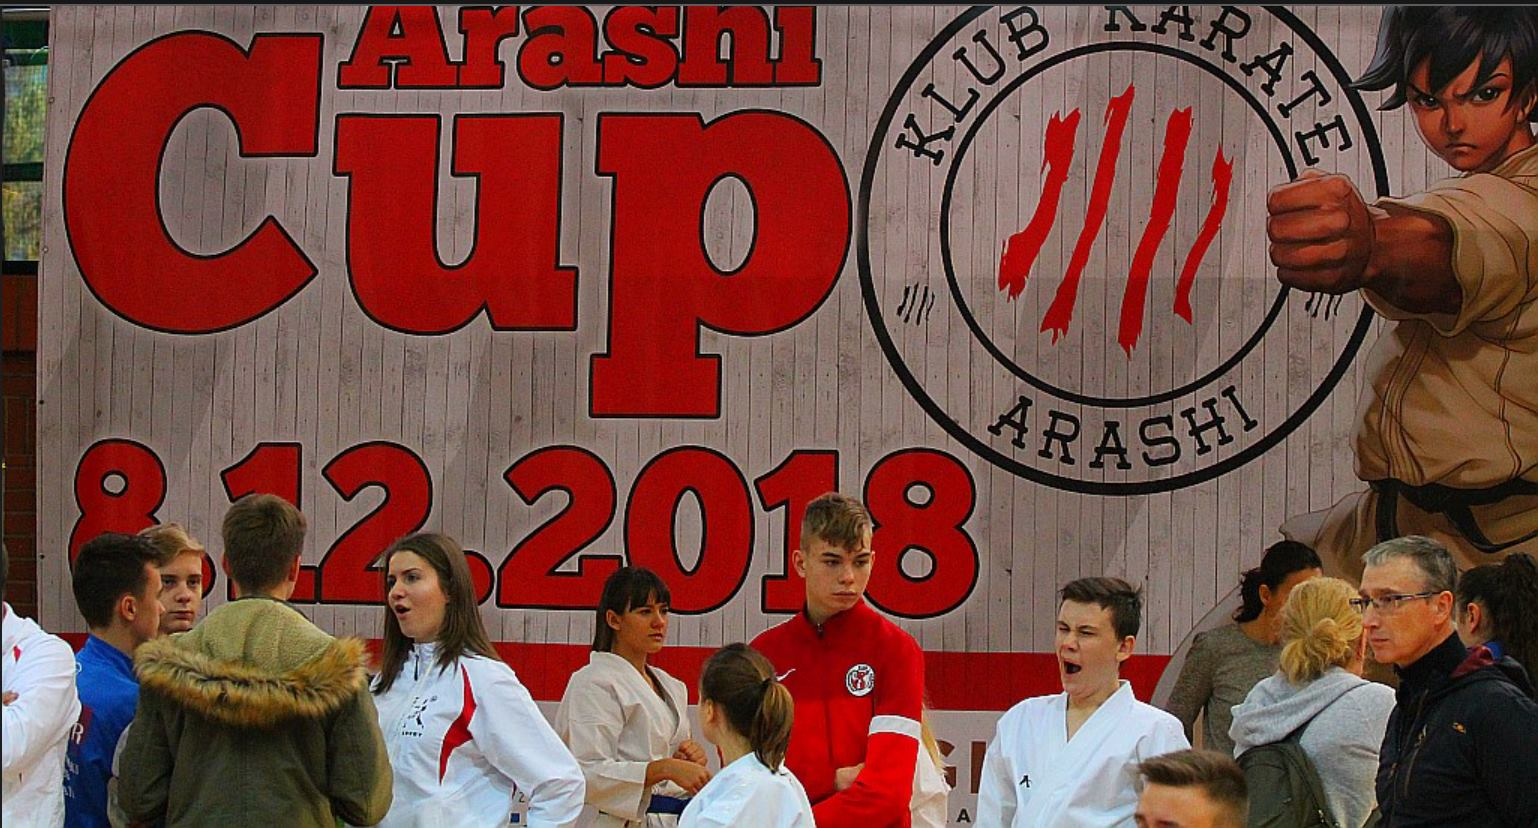 ARASHI CUP – Legnica